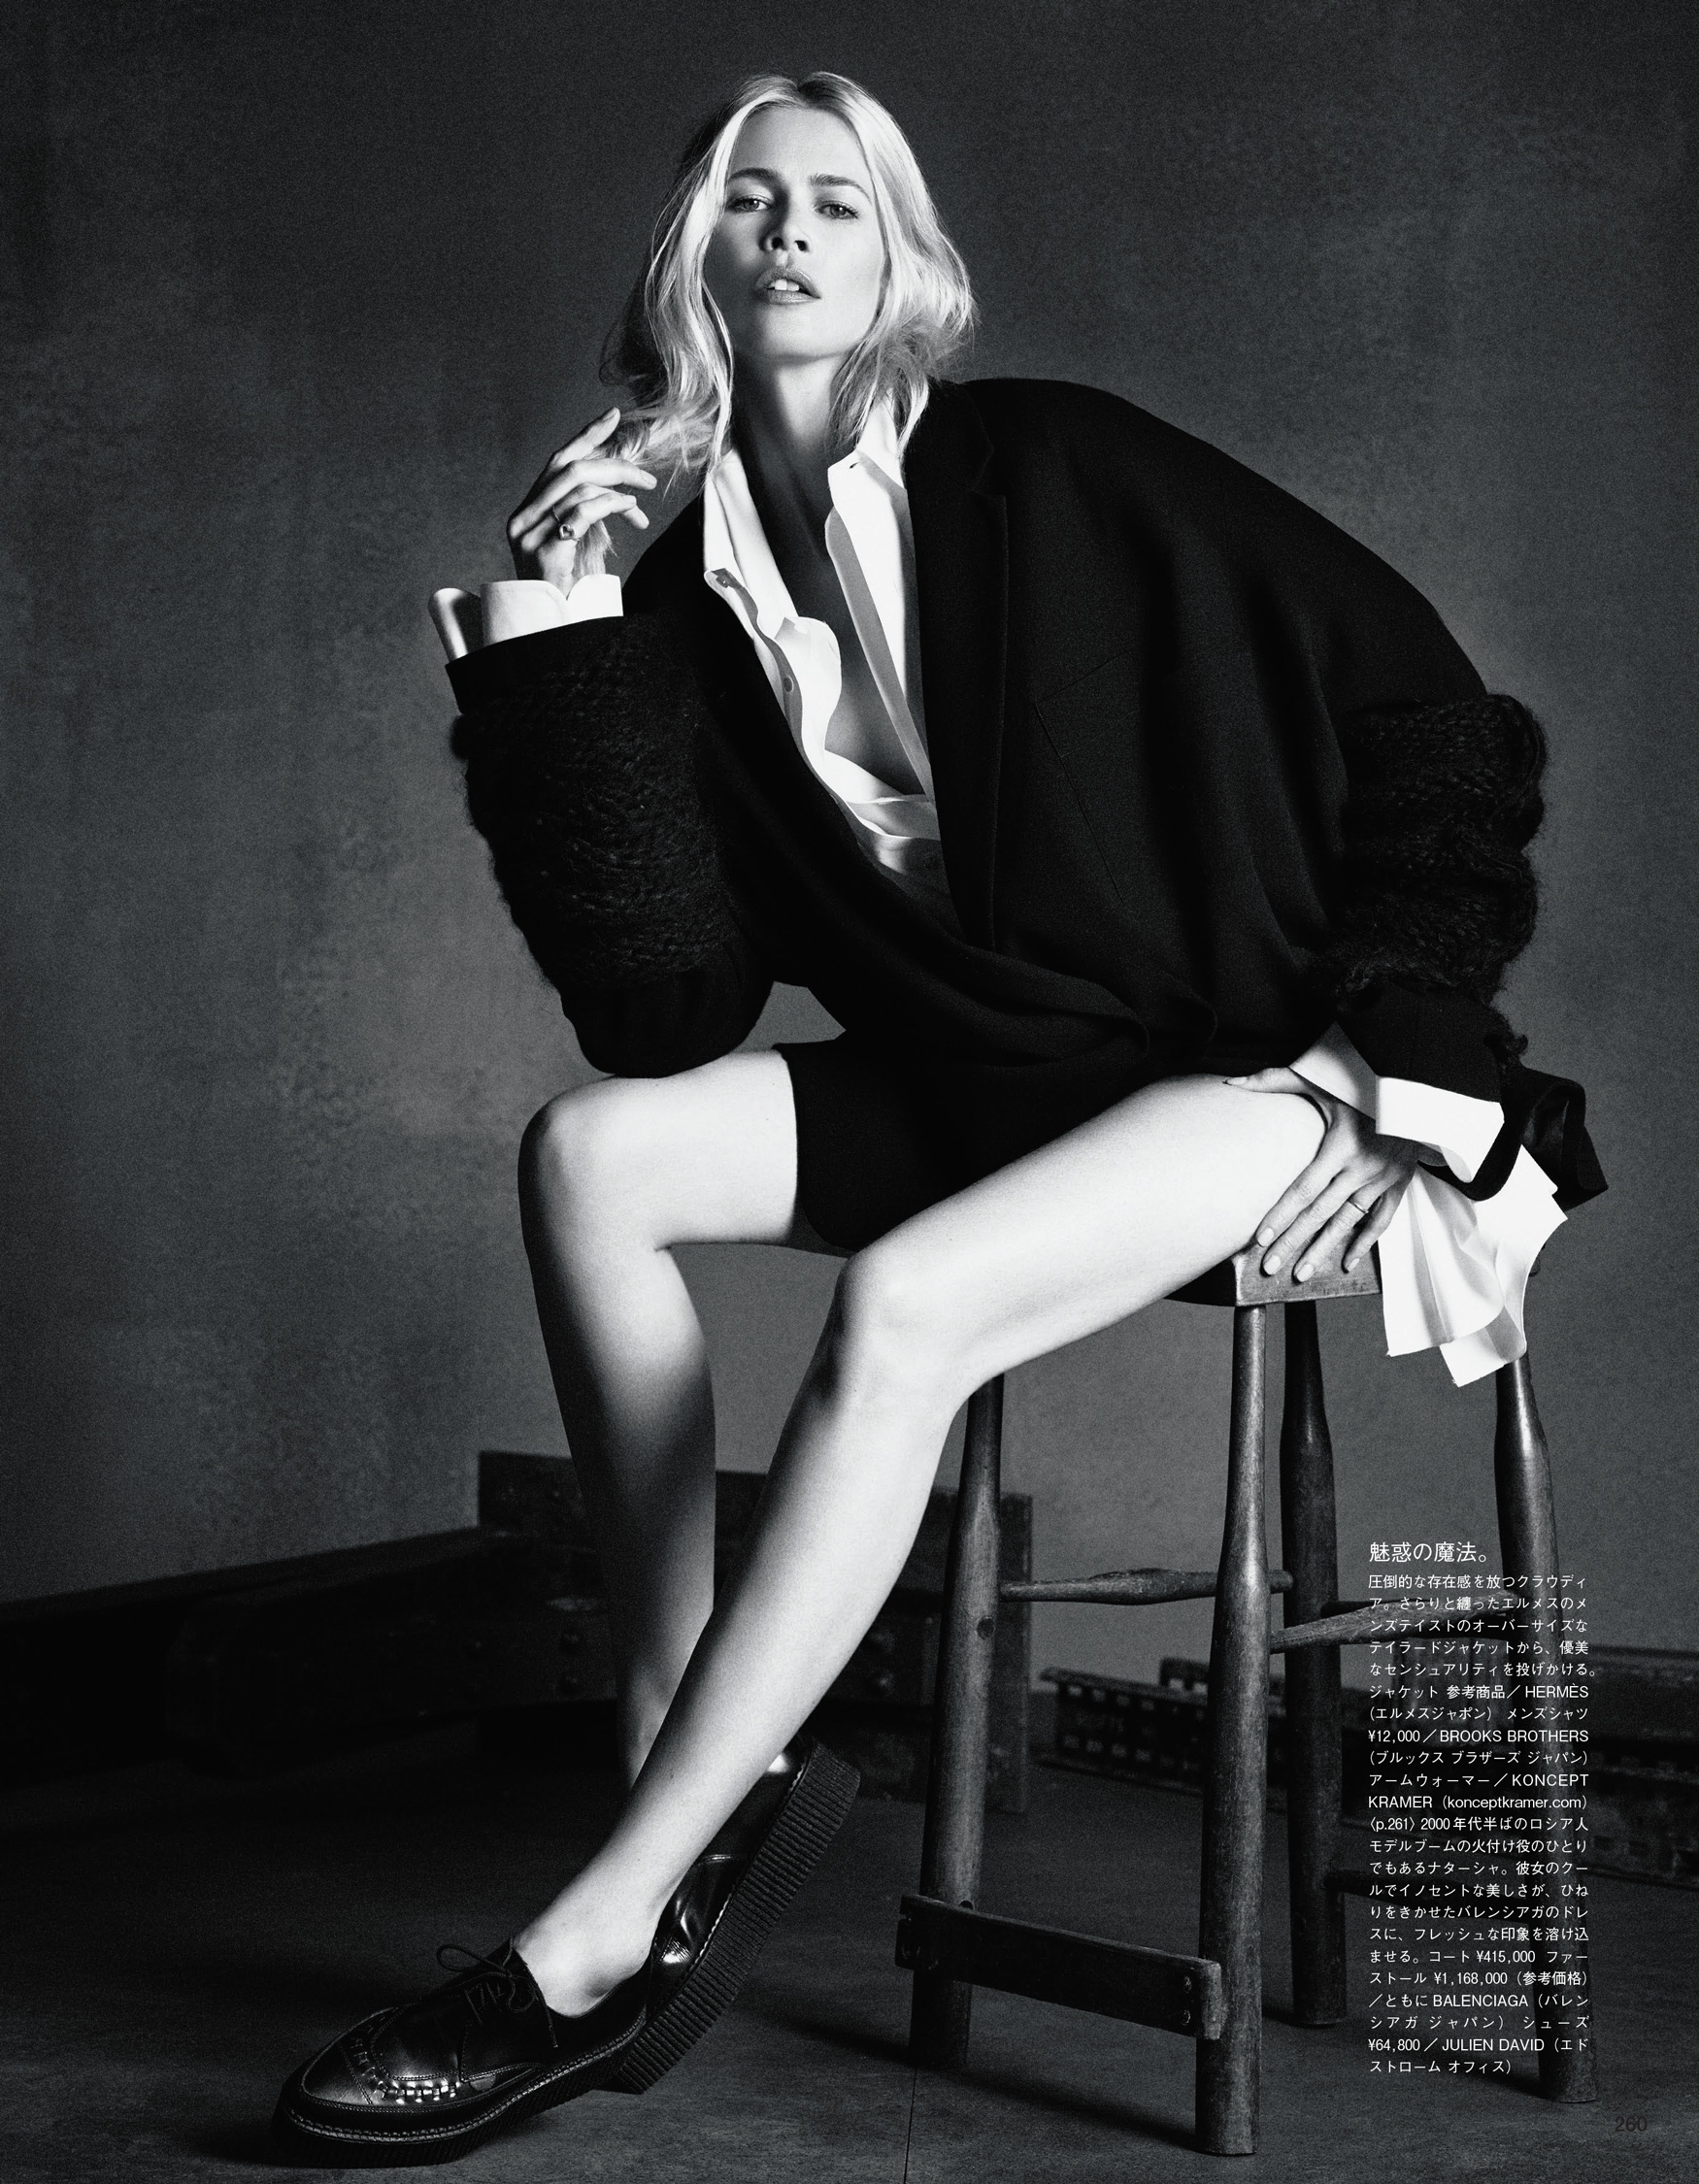 Giovanna-Battaglia-The-Icons-Of-Perfections-Vogue-Japan-15th-Anniversary-Issue-Luigi-Iango-V181_260_200-8.jpg